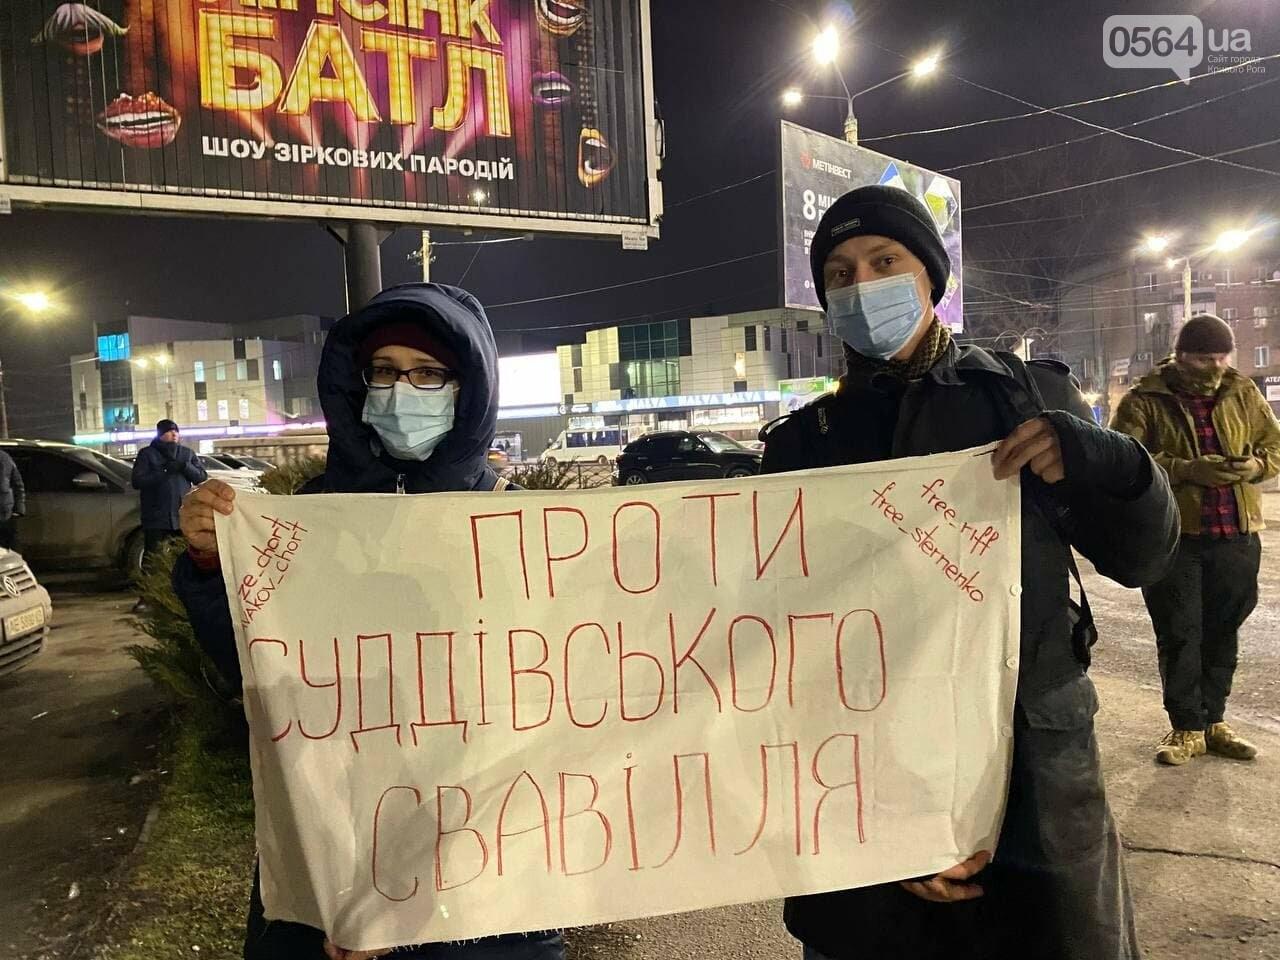 """Свободу політв'язням! #ВолюСтерненку #FreeRiffmaster"", - в Кривом Роге активисты вышли на протест, - ФОТО, ВИДЕО, фото-1"